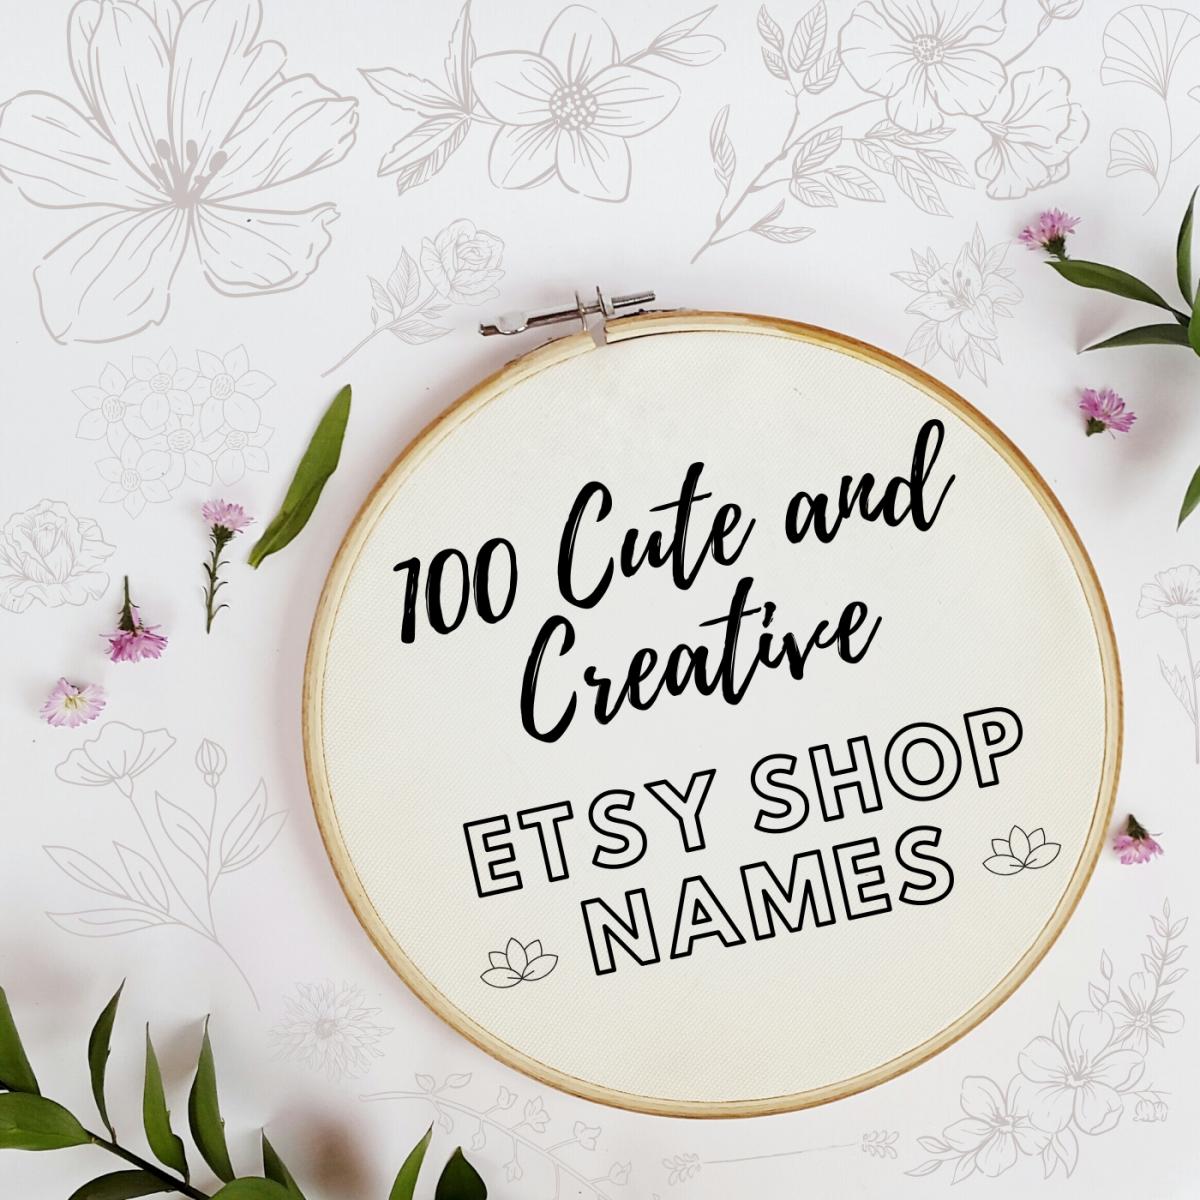 100 Crafty Etsy Shop Name Ideas Toughnickel